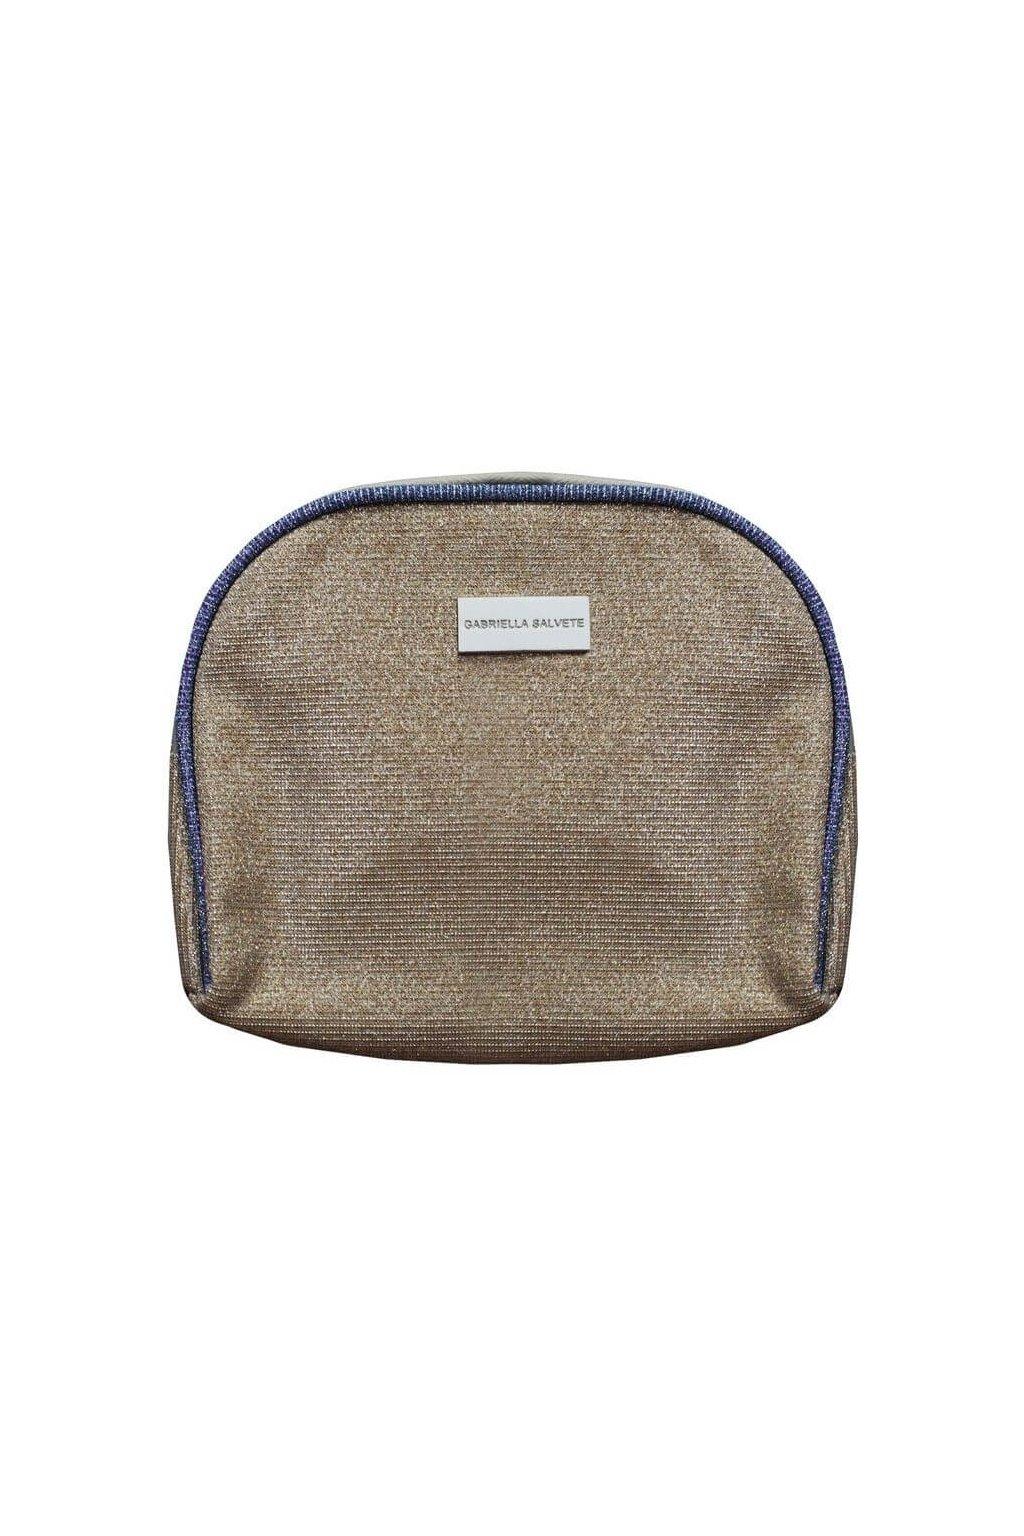 gabriella salvete kosmeticka taska cosmetic bag no 1